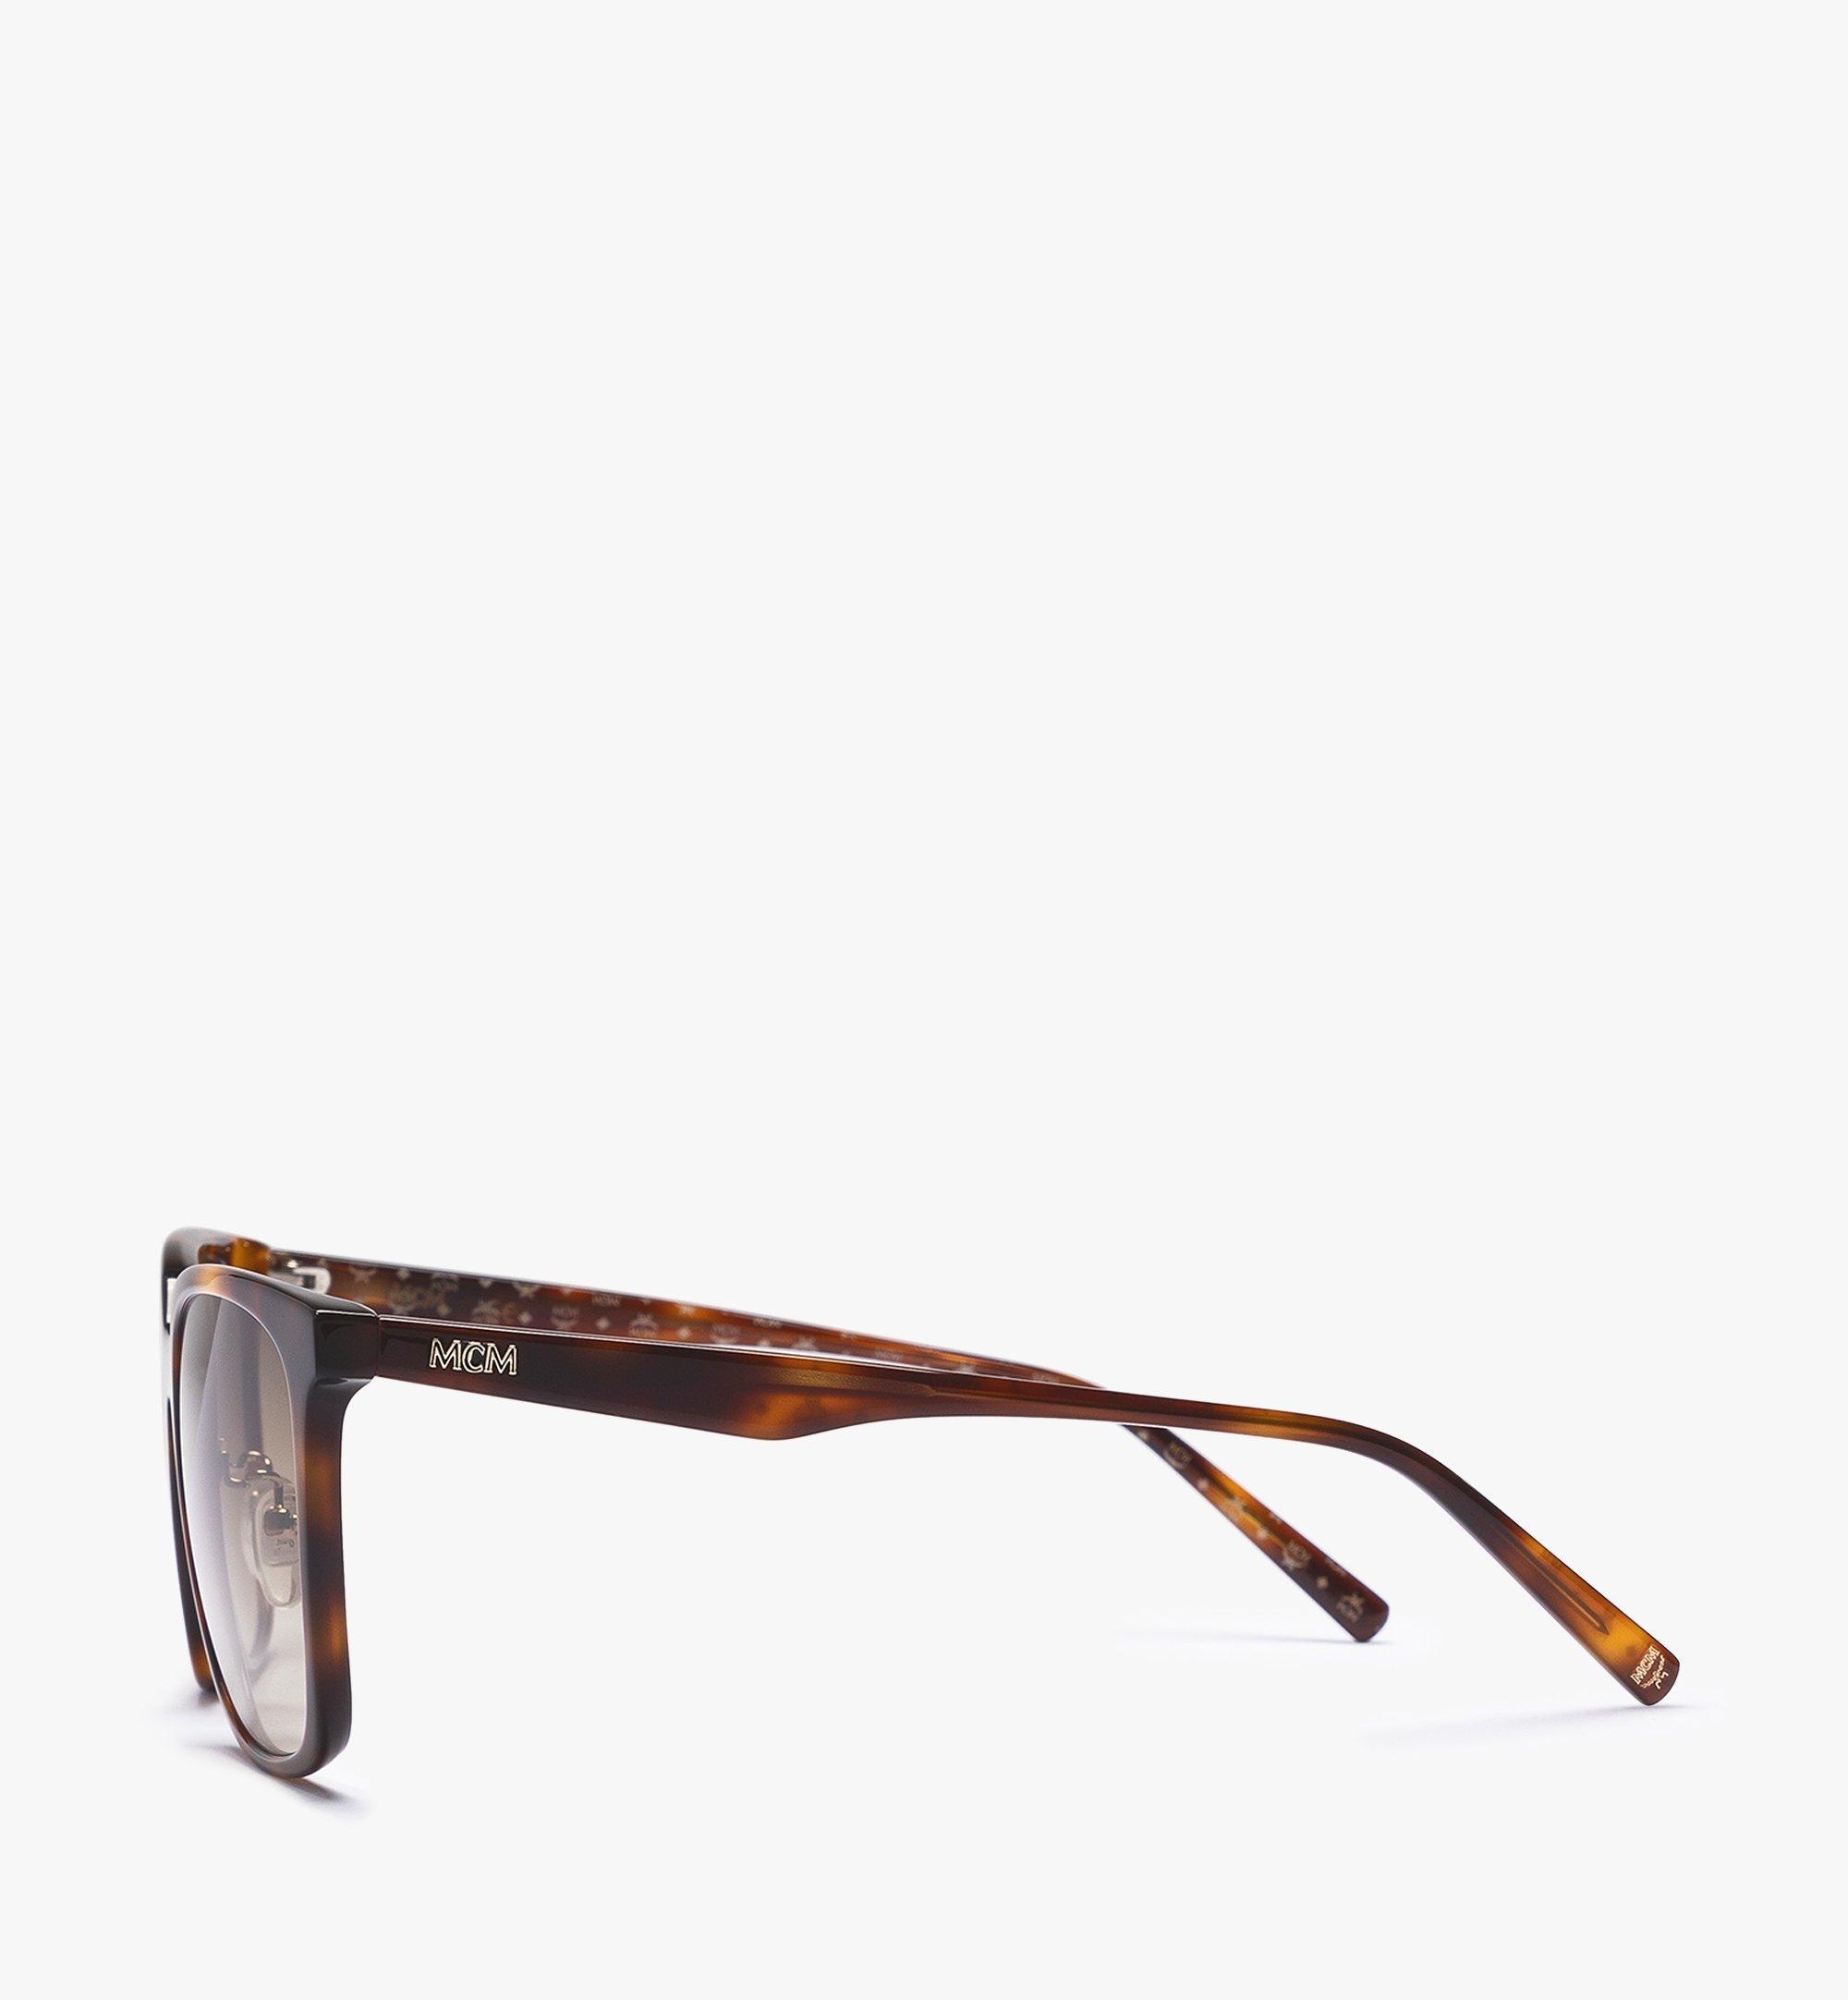 MCM MCM714SA Rectangular Sunglasses Brown MEGBAMM10N3001 Alternate View 1